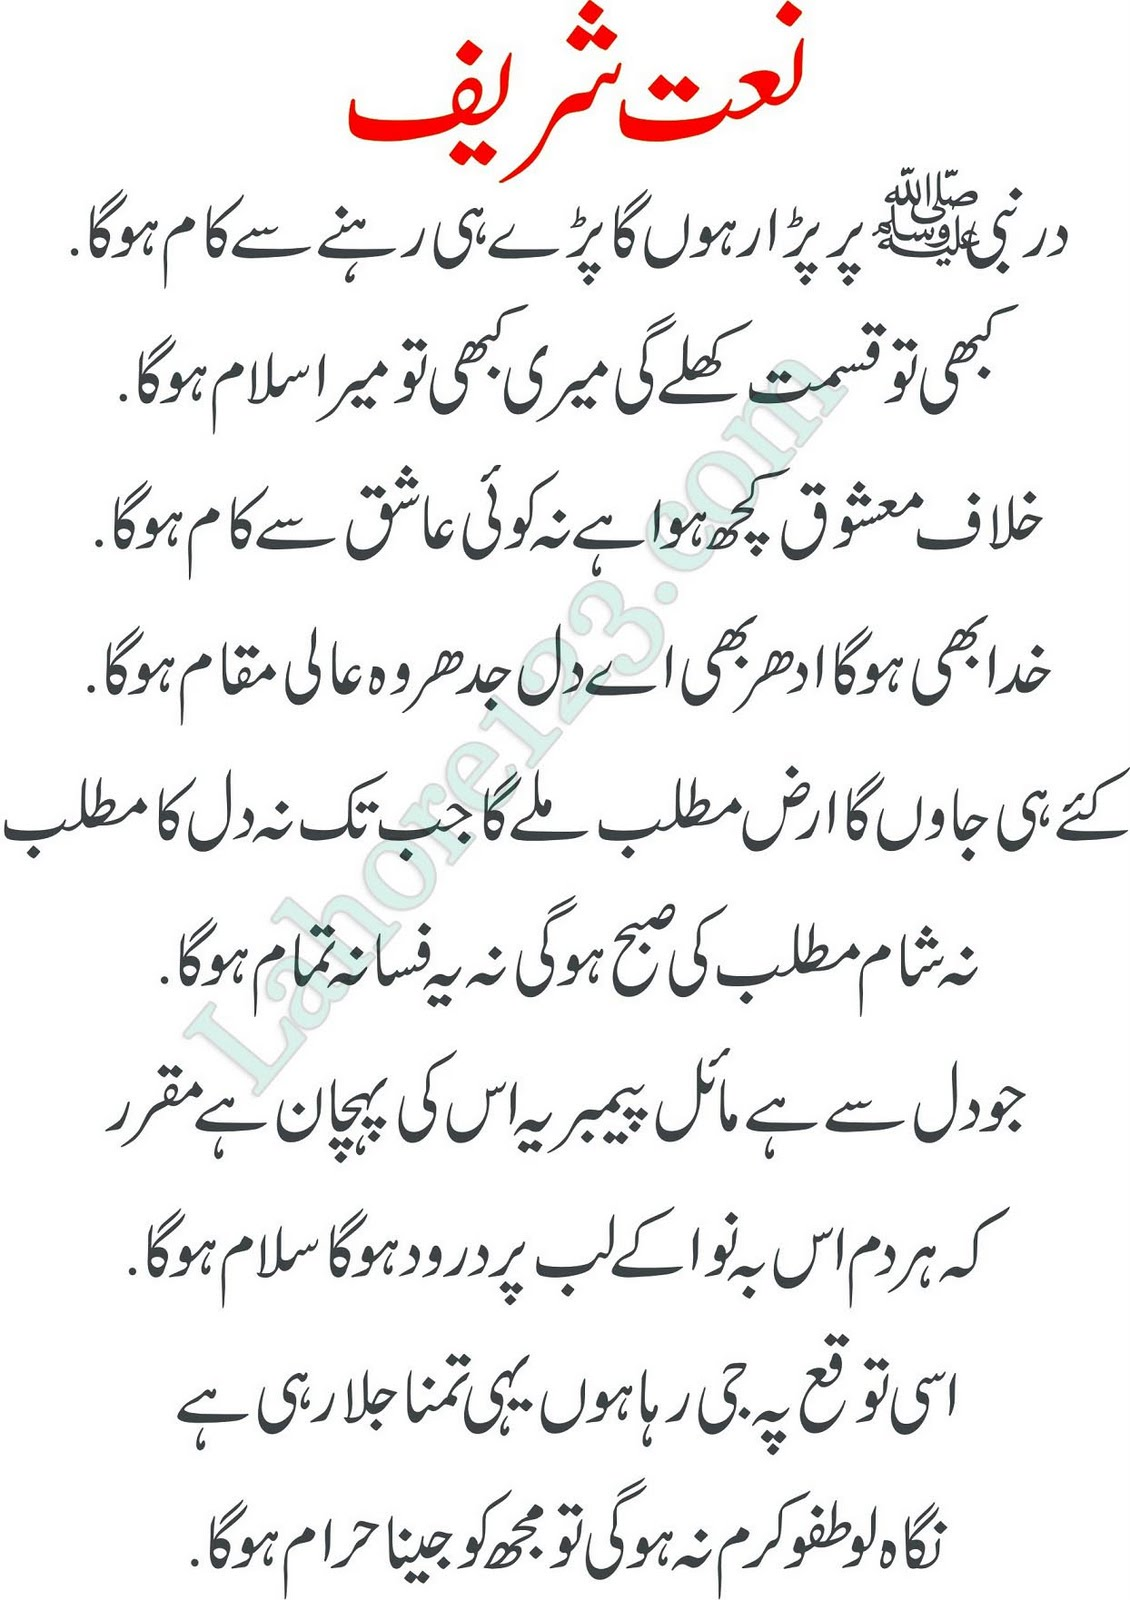 Urdu Condolences... Help For Condolences In Urdu...